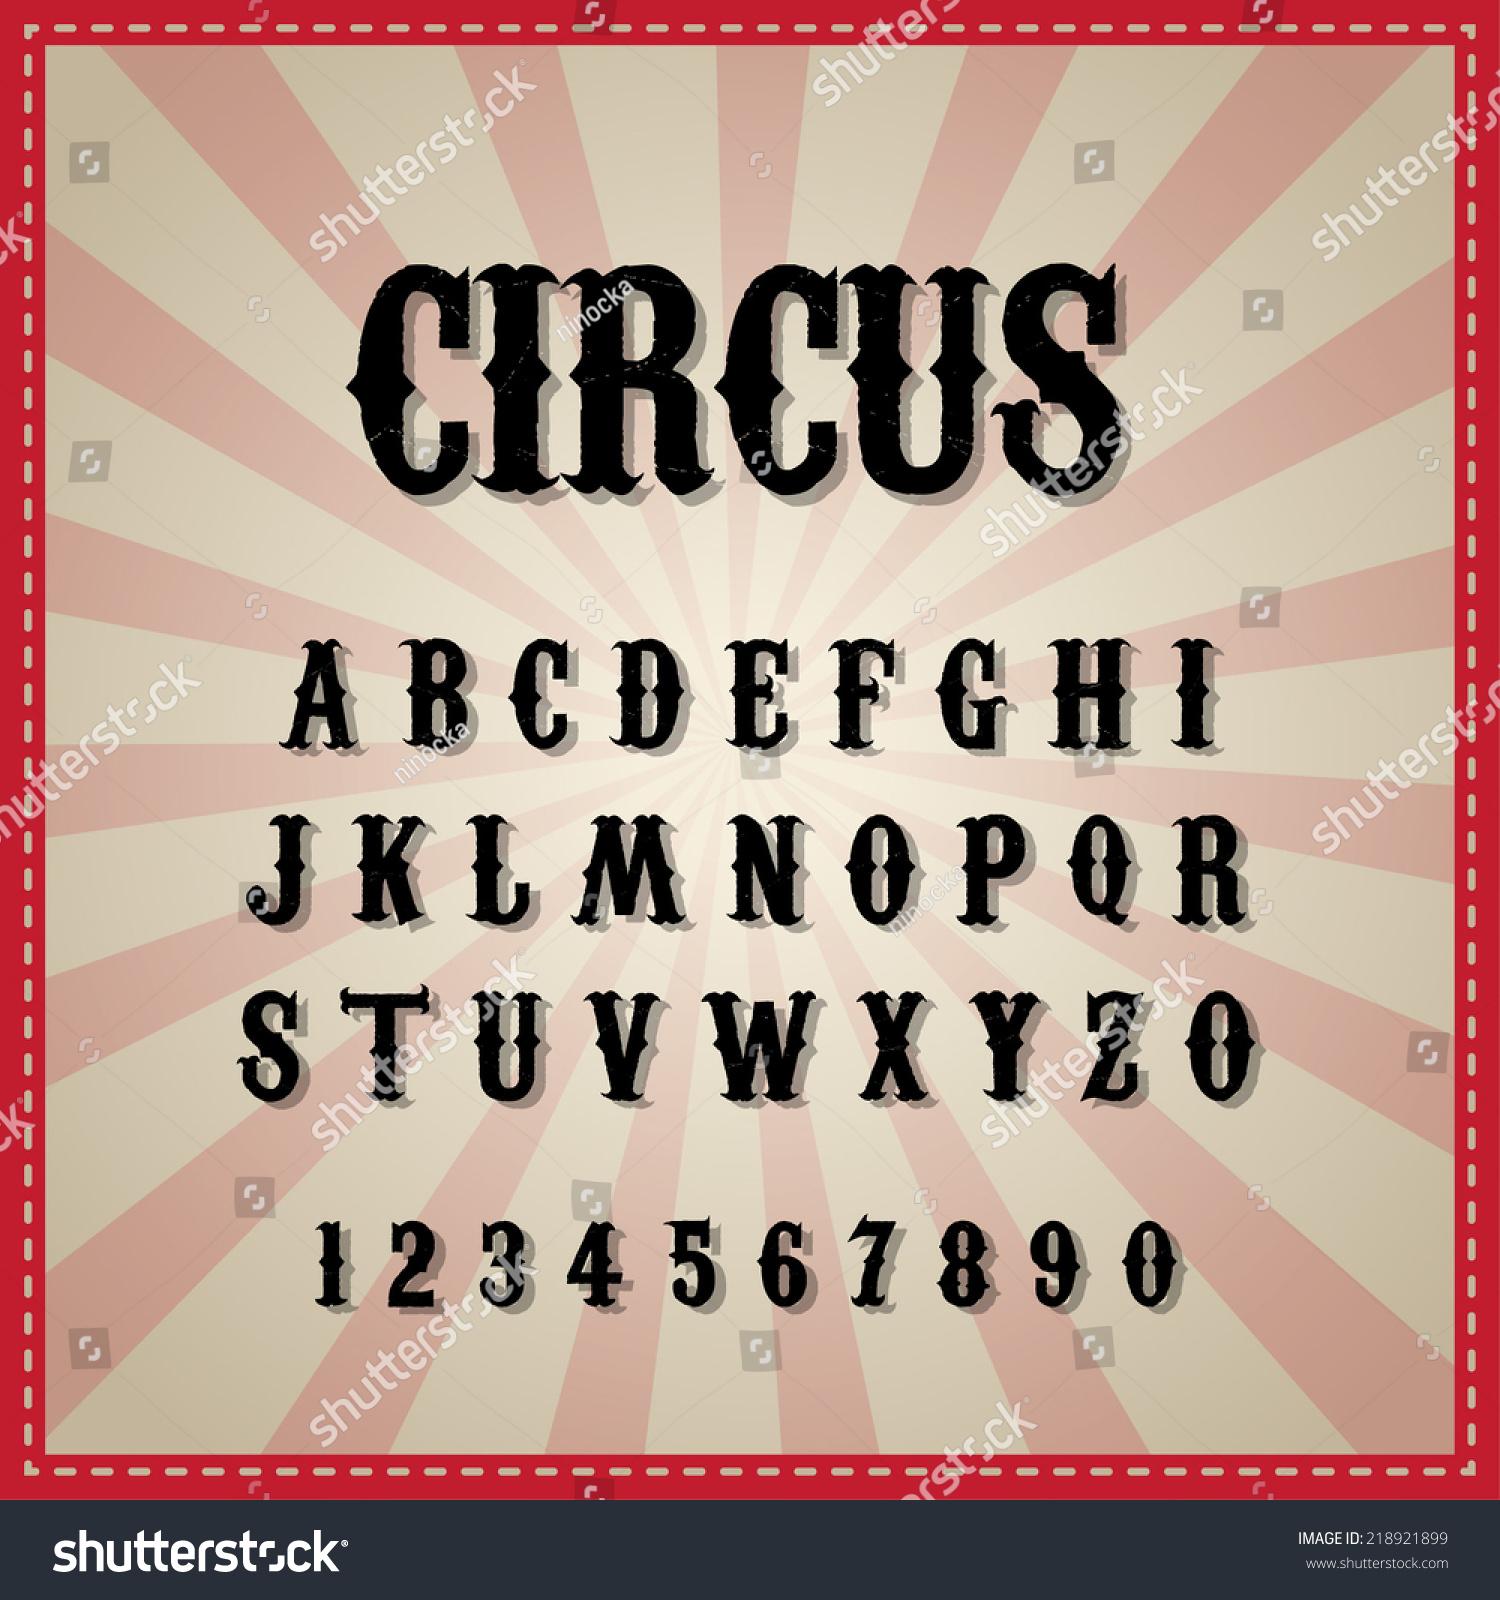 Vintage Circus Font Stock Vector 218921899 : Shutterstock